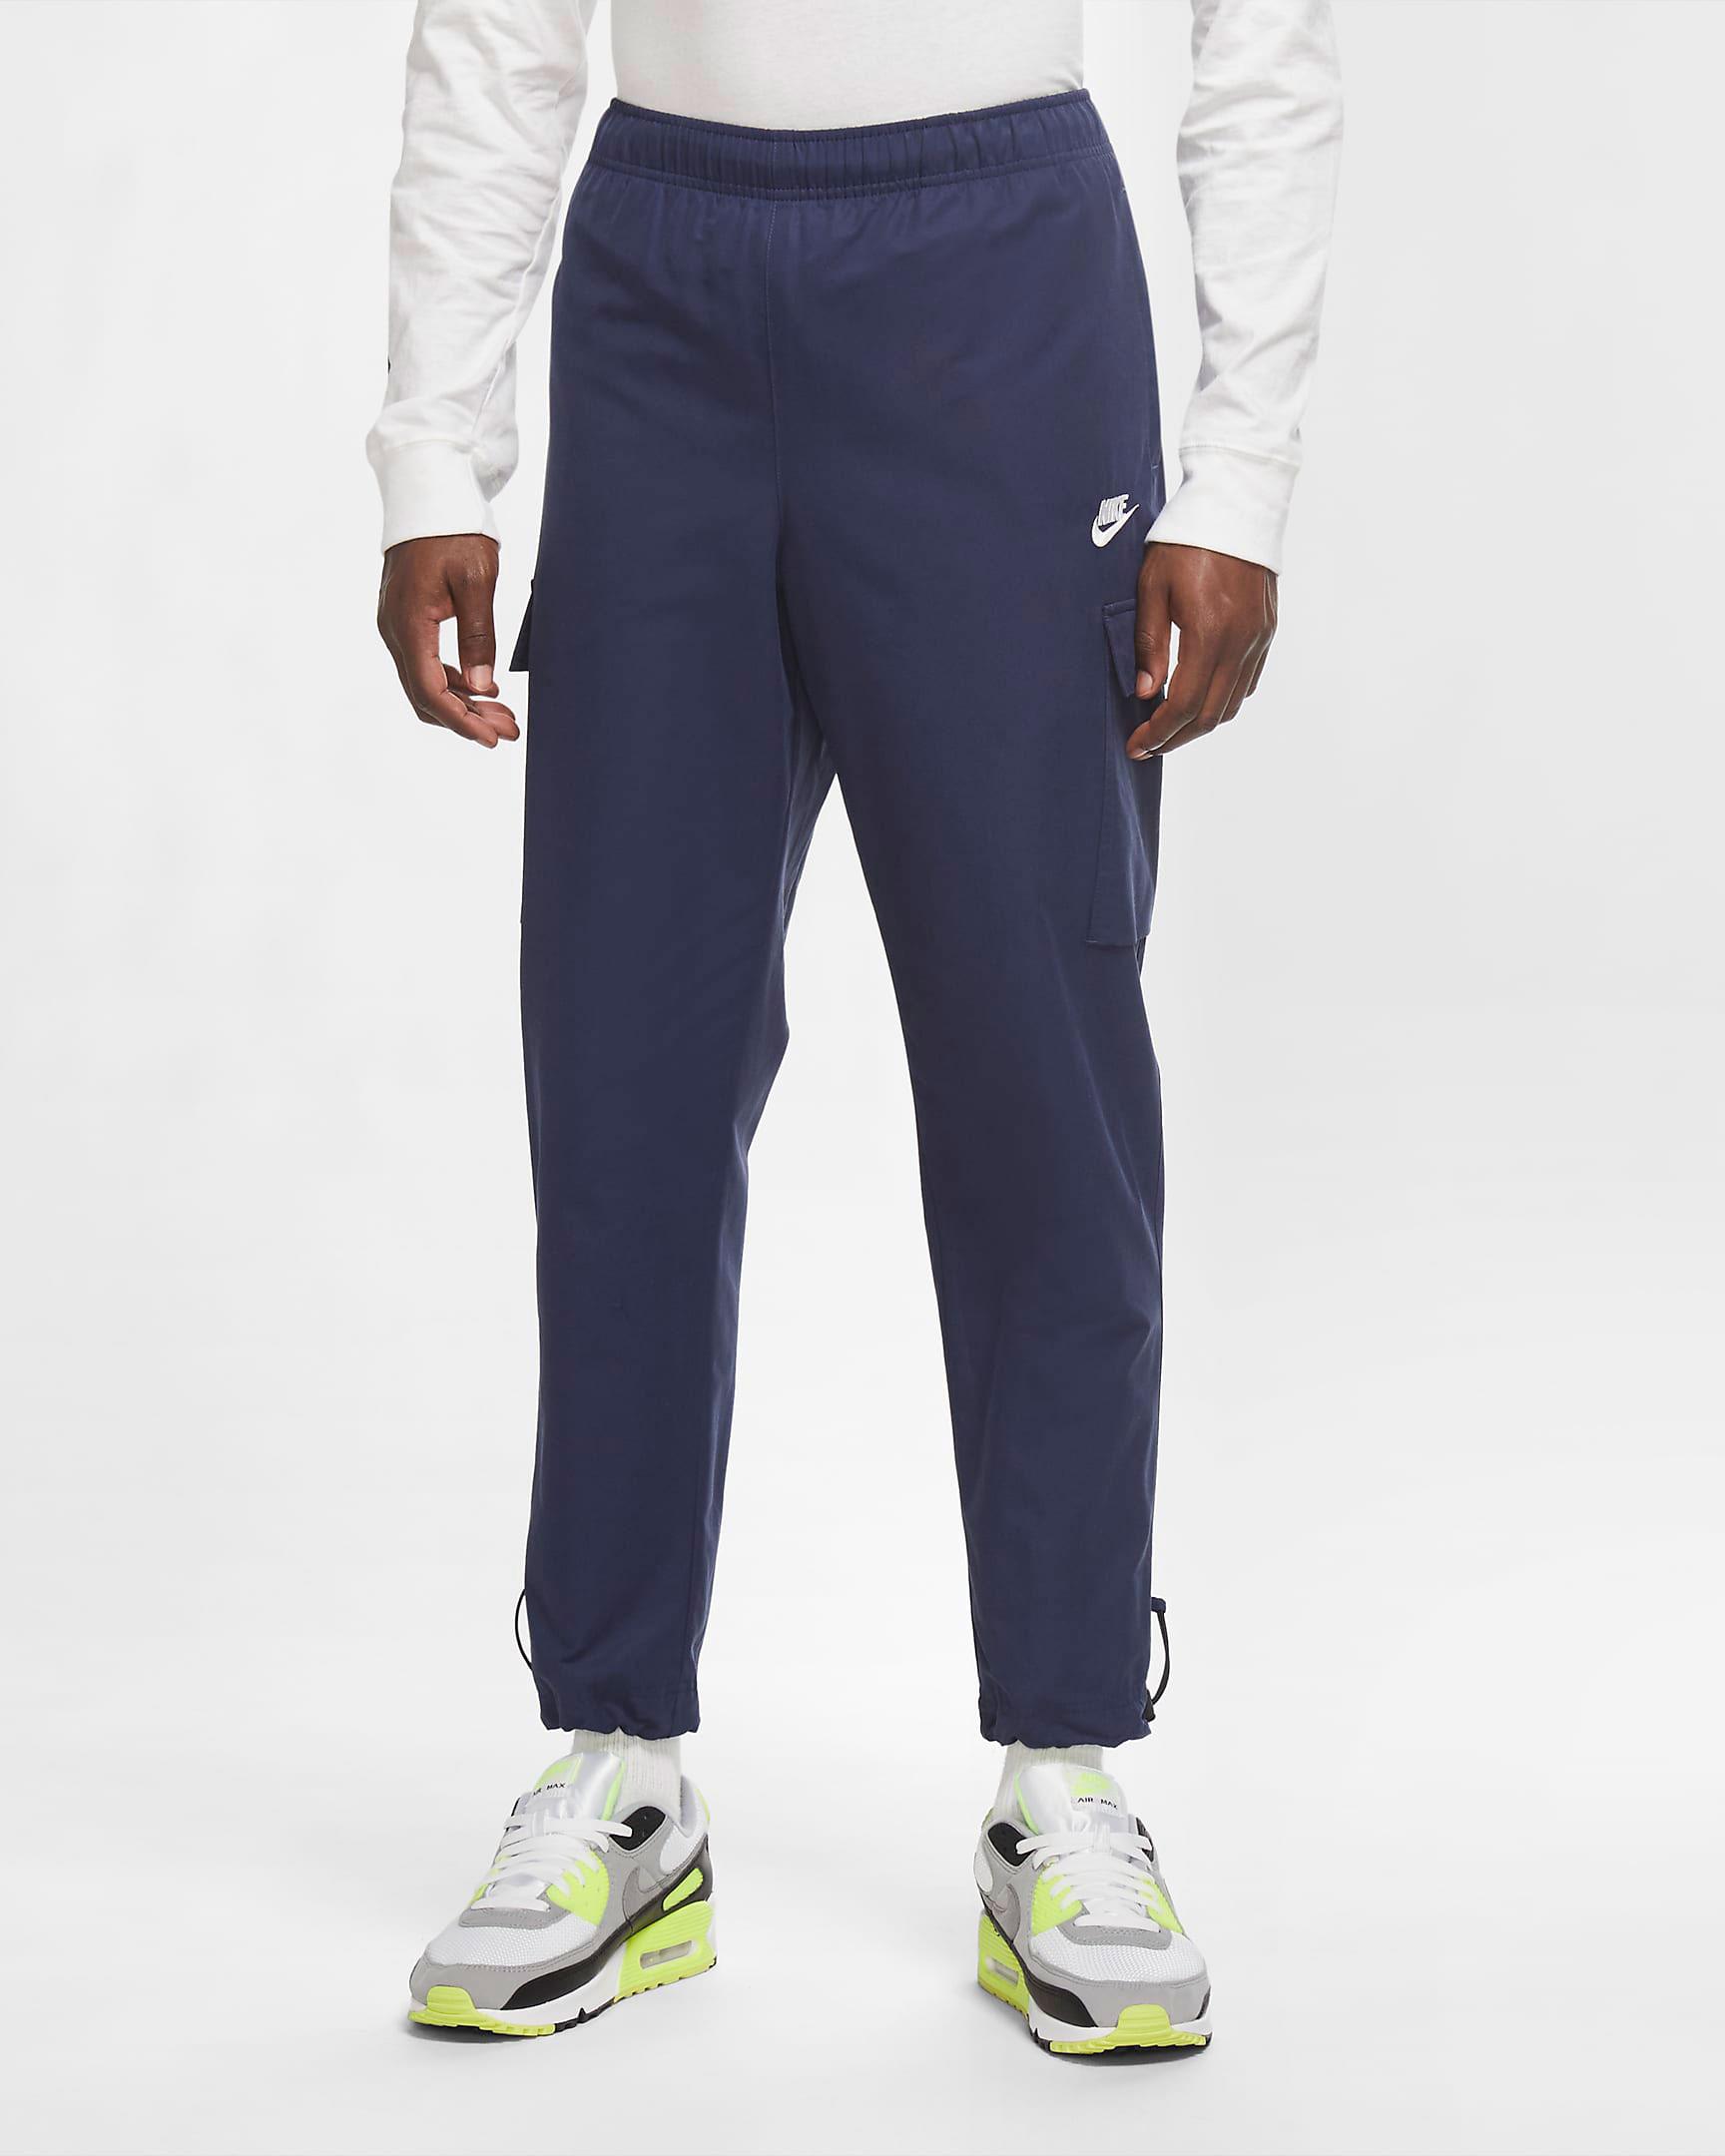 jordan-1-high-midnight-navy-nike-cargo-pants